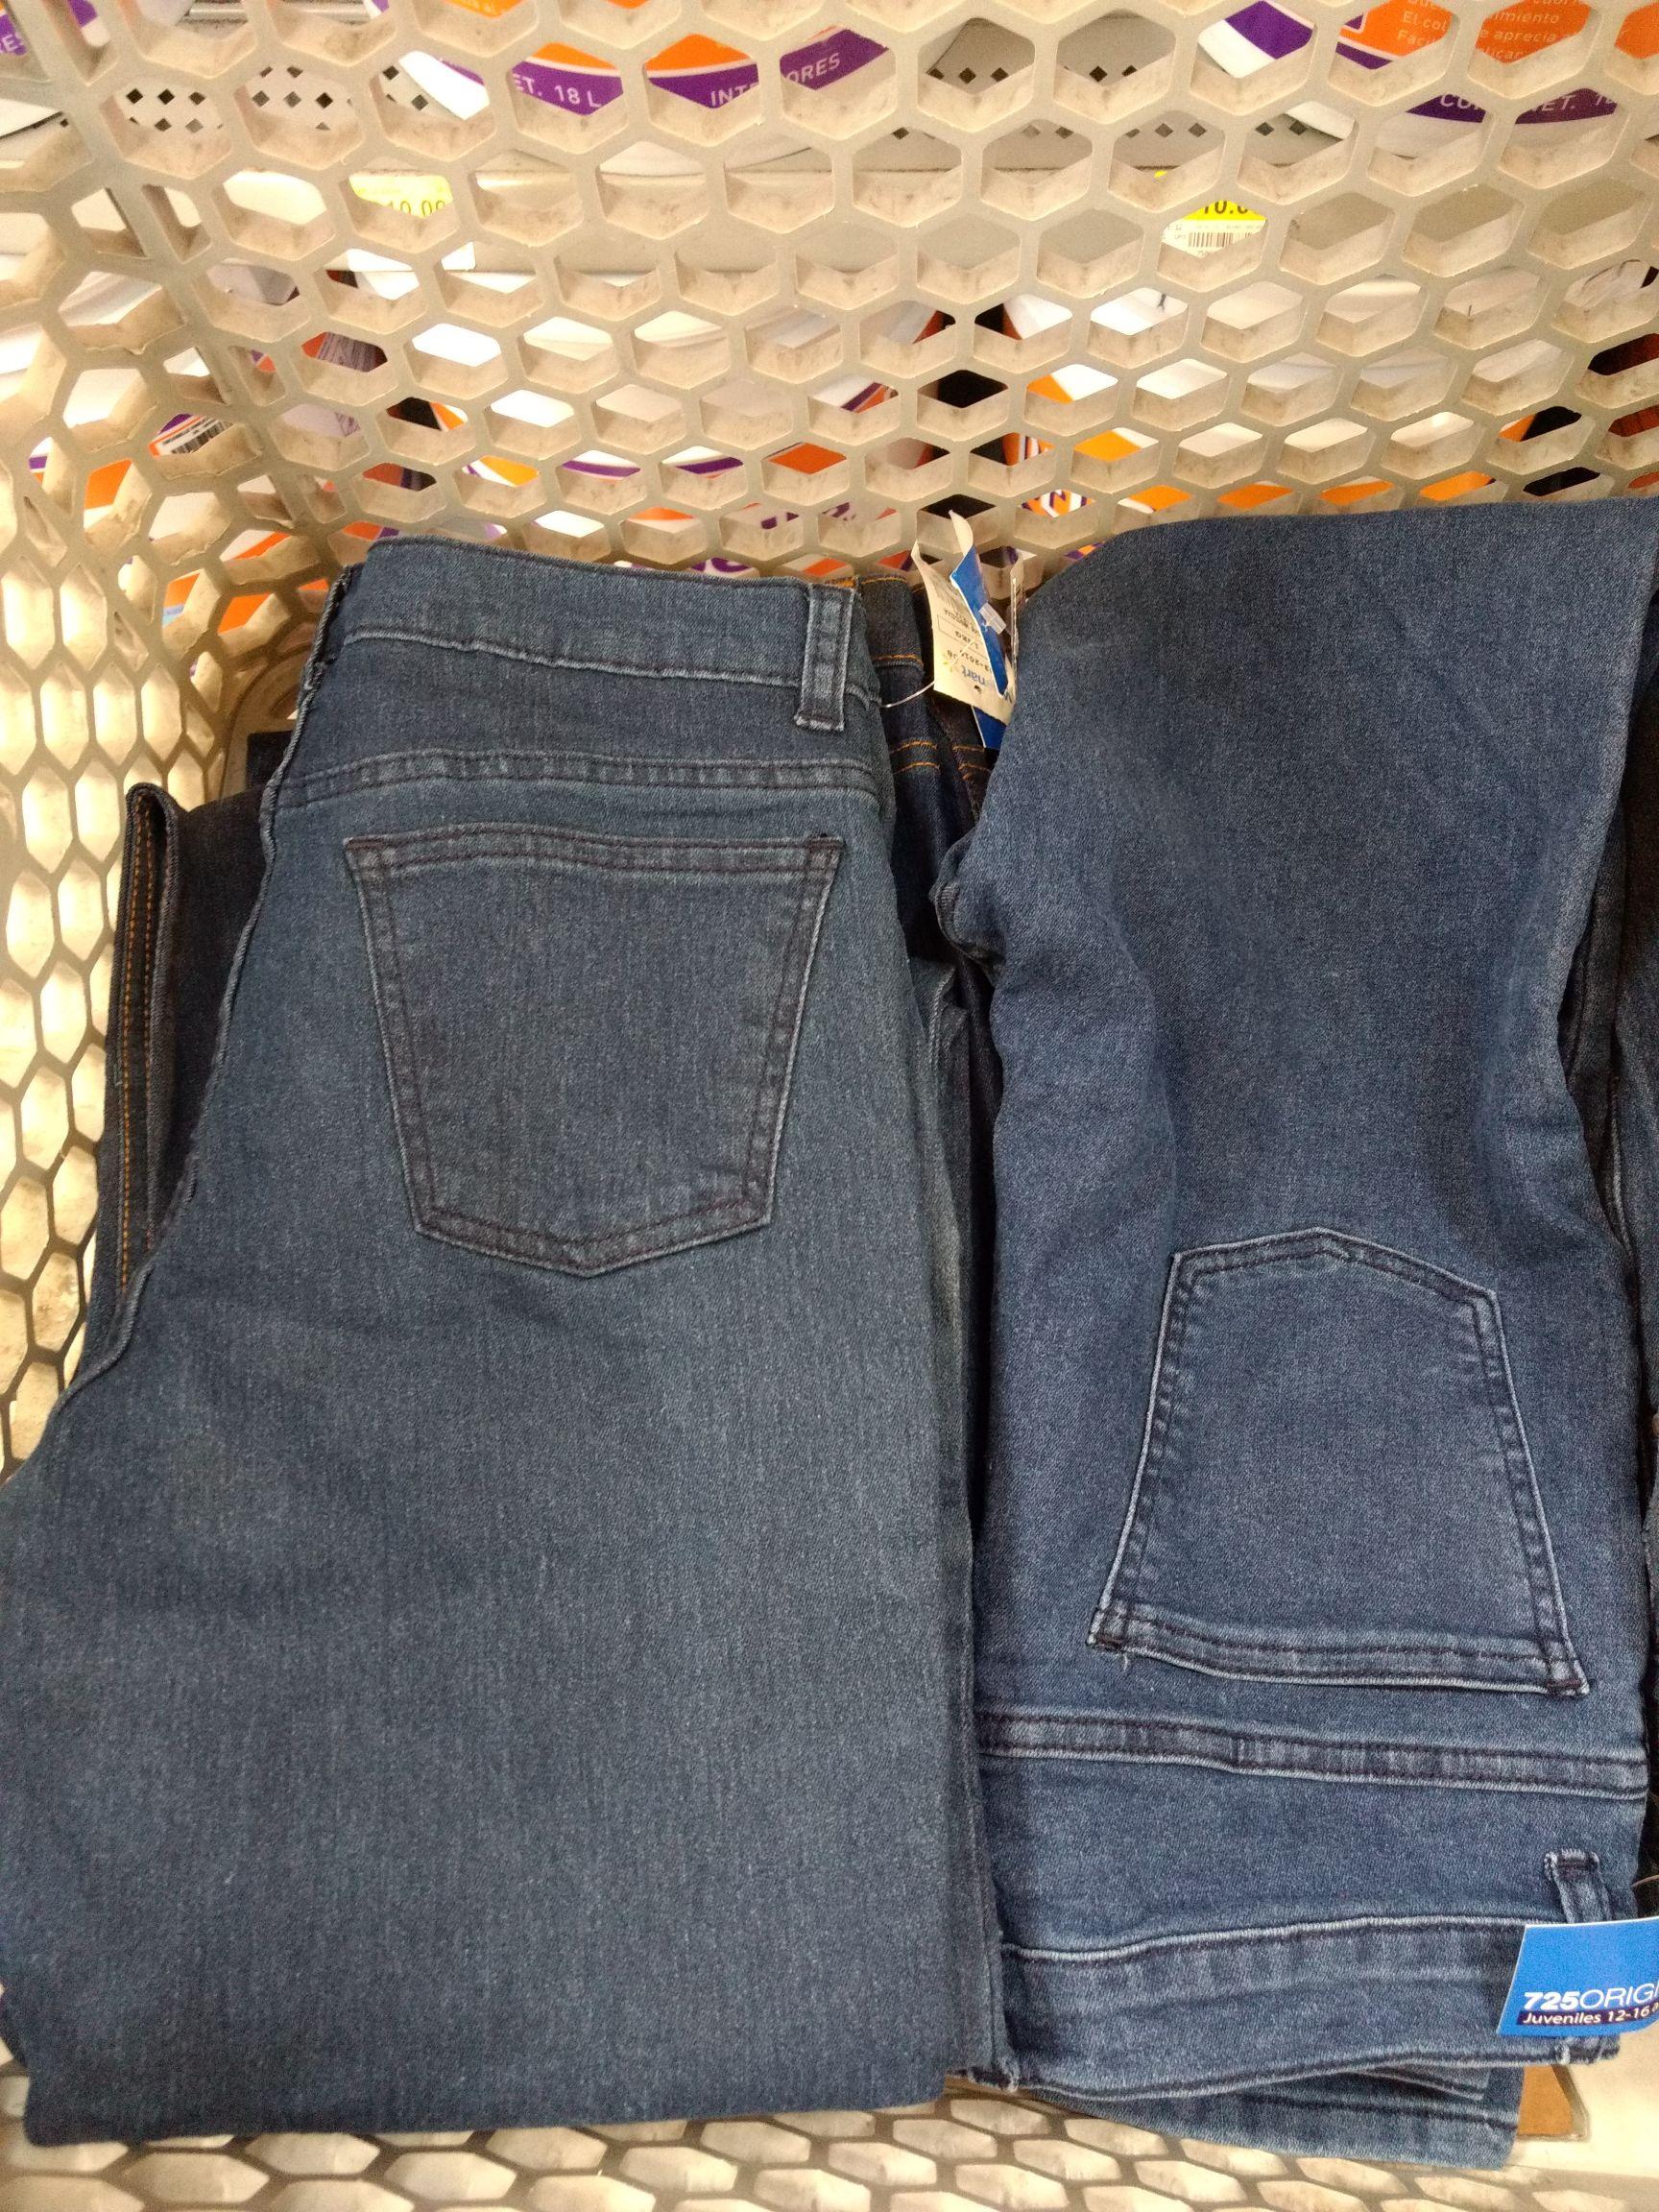 Walmart: Pantalón de mezclilla juvenil (12-16 EG) 30.01